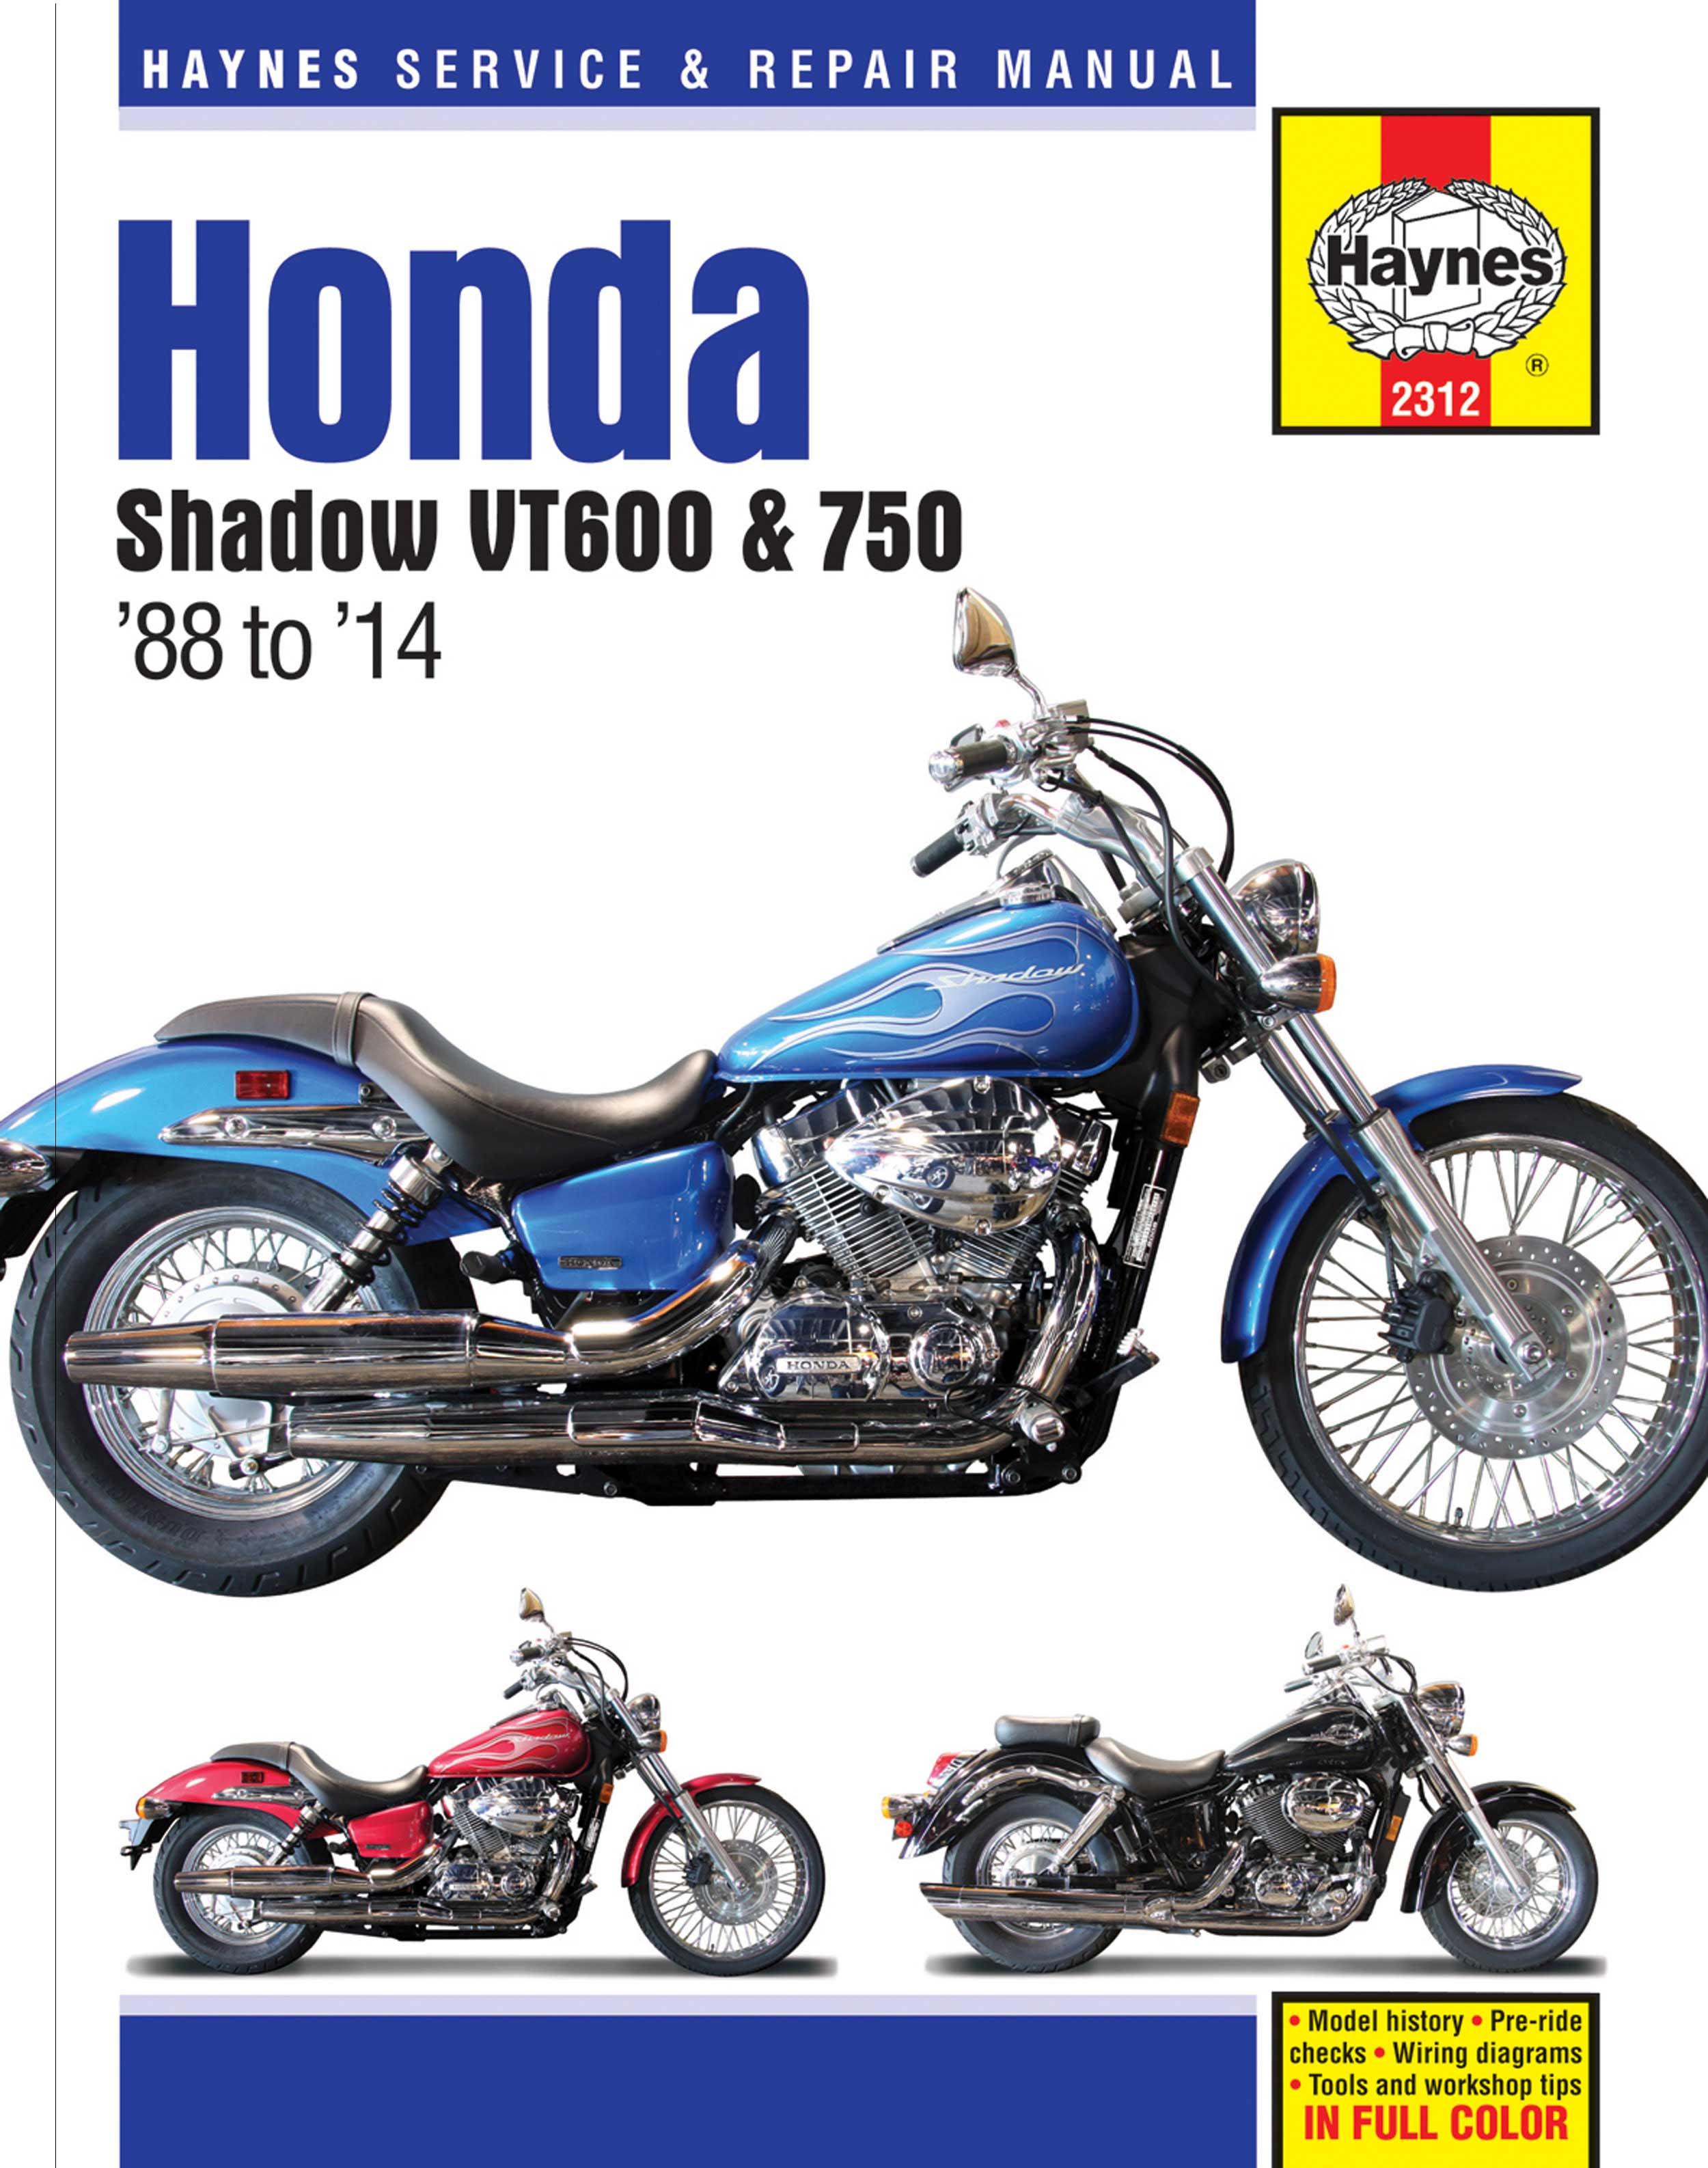 fits honda vt 750 c2 shadow black spirit uk 2007 2009 manuals rh ebay co uk 2009 honda shadow spirit 750 owners manual 2007 Honda Shadow 750 Specs